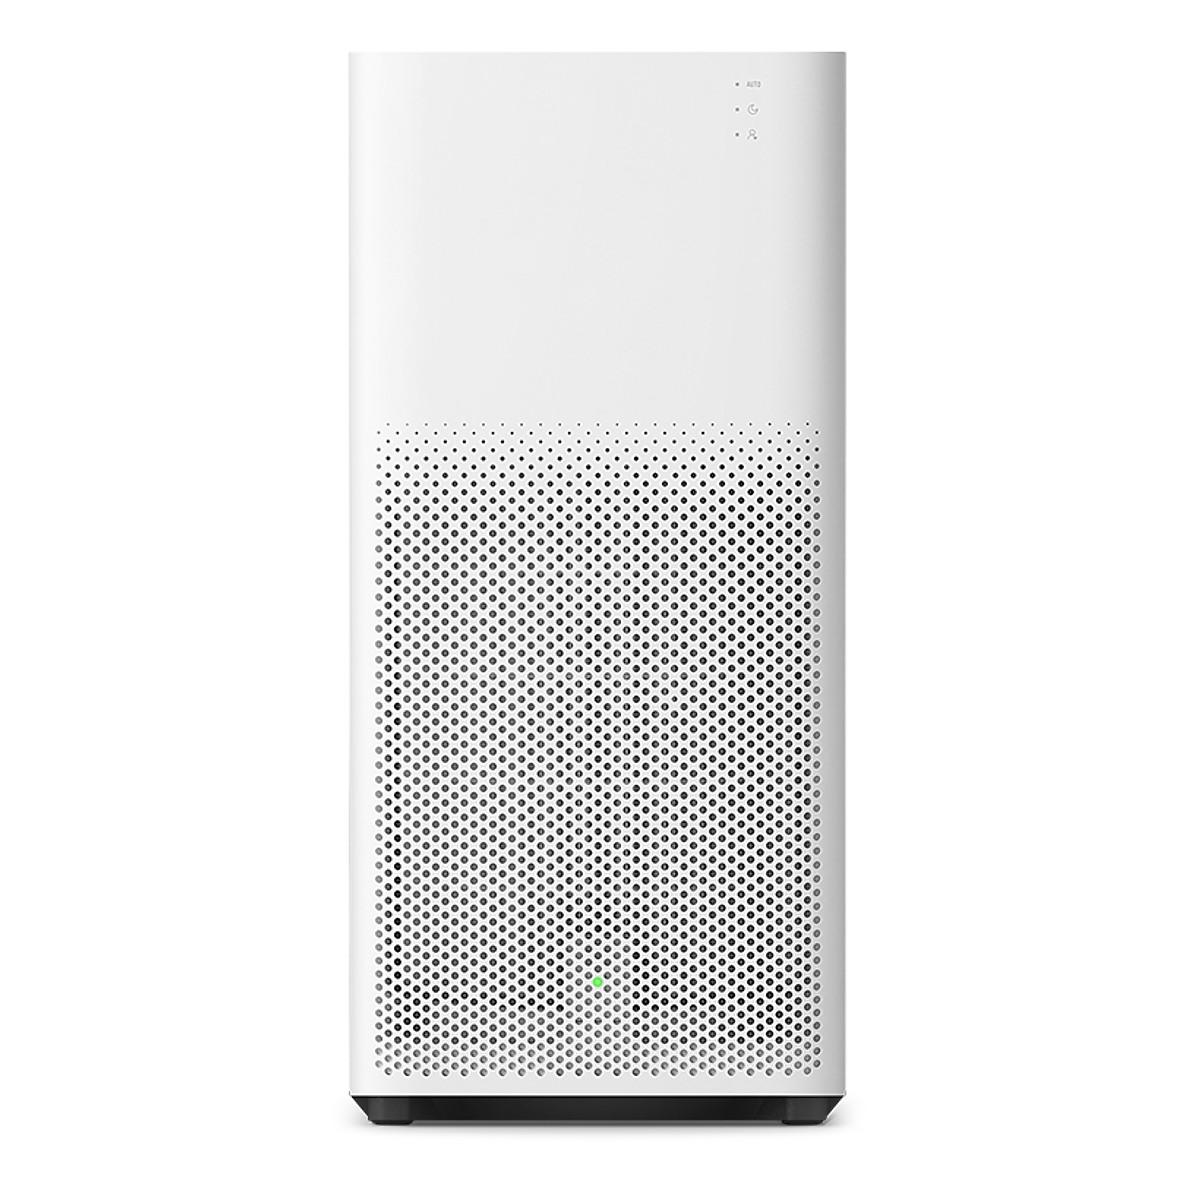 Máy lọc không khí Xiaomi Mi Air Purifier 2H (31W)